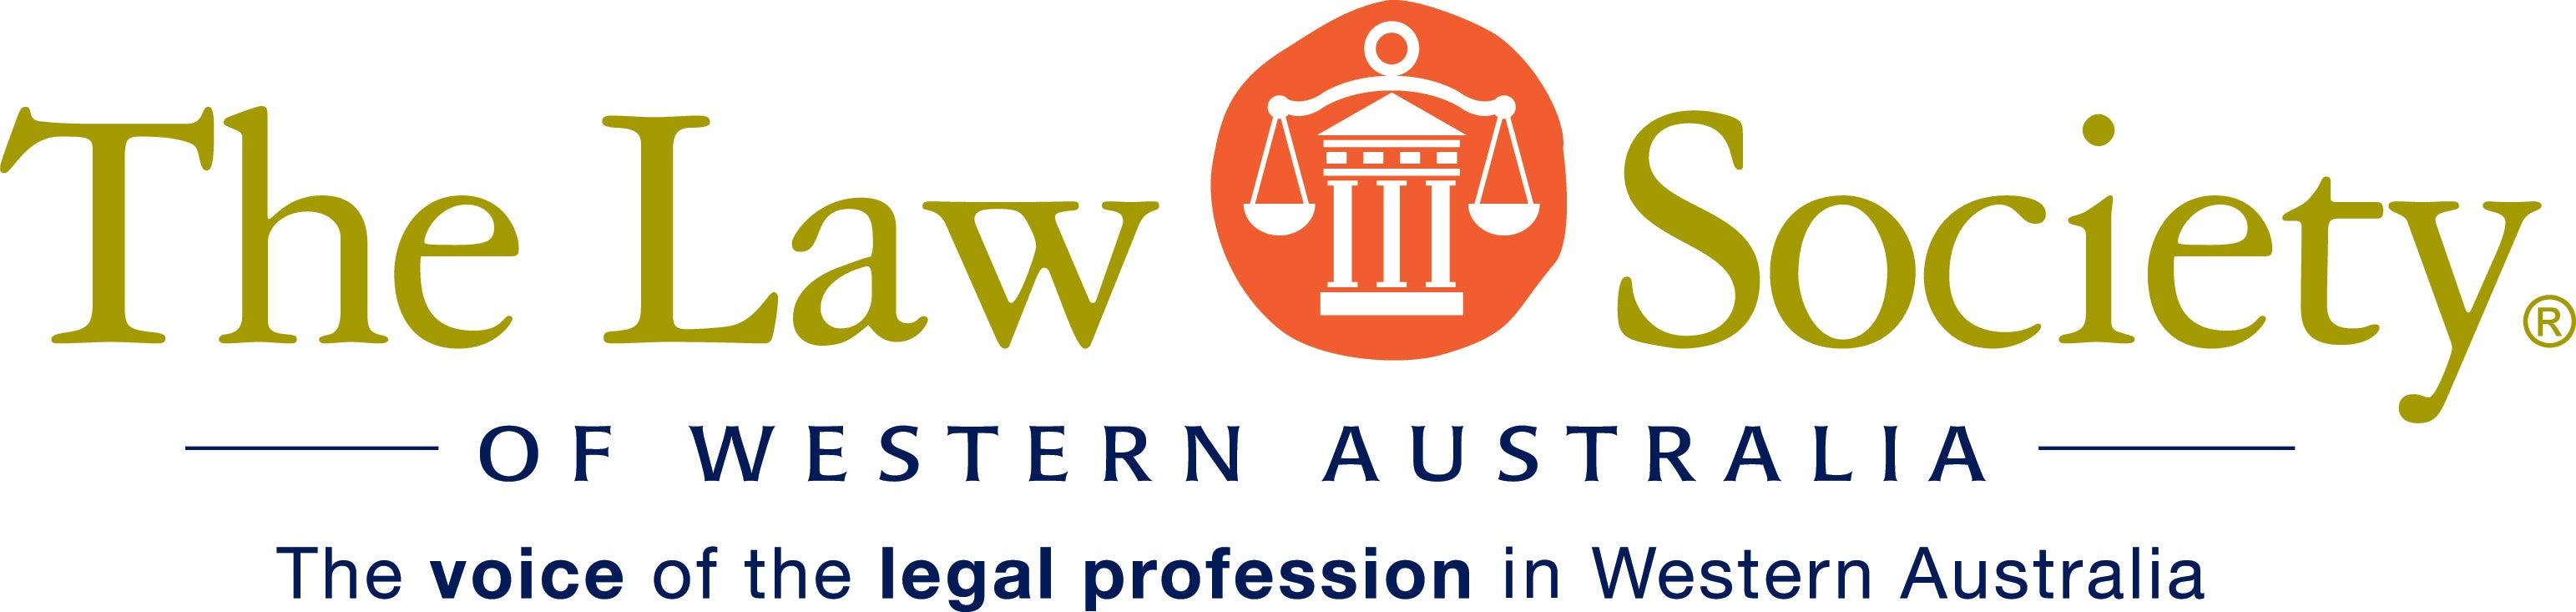 the Law Society of Western Australia logo